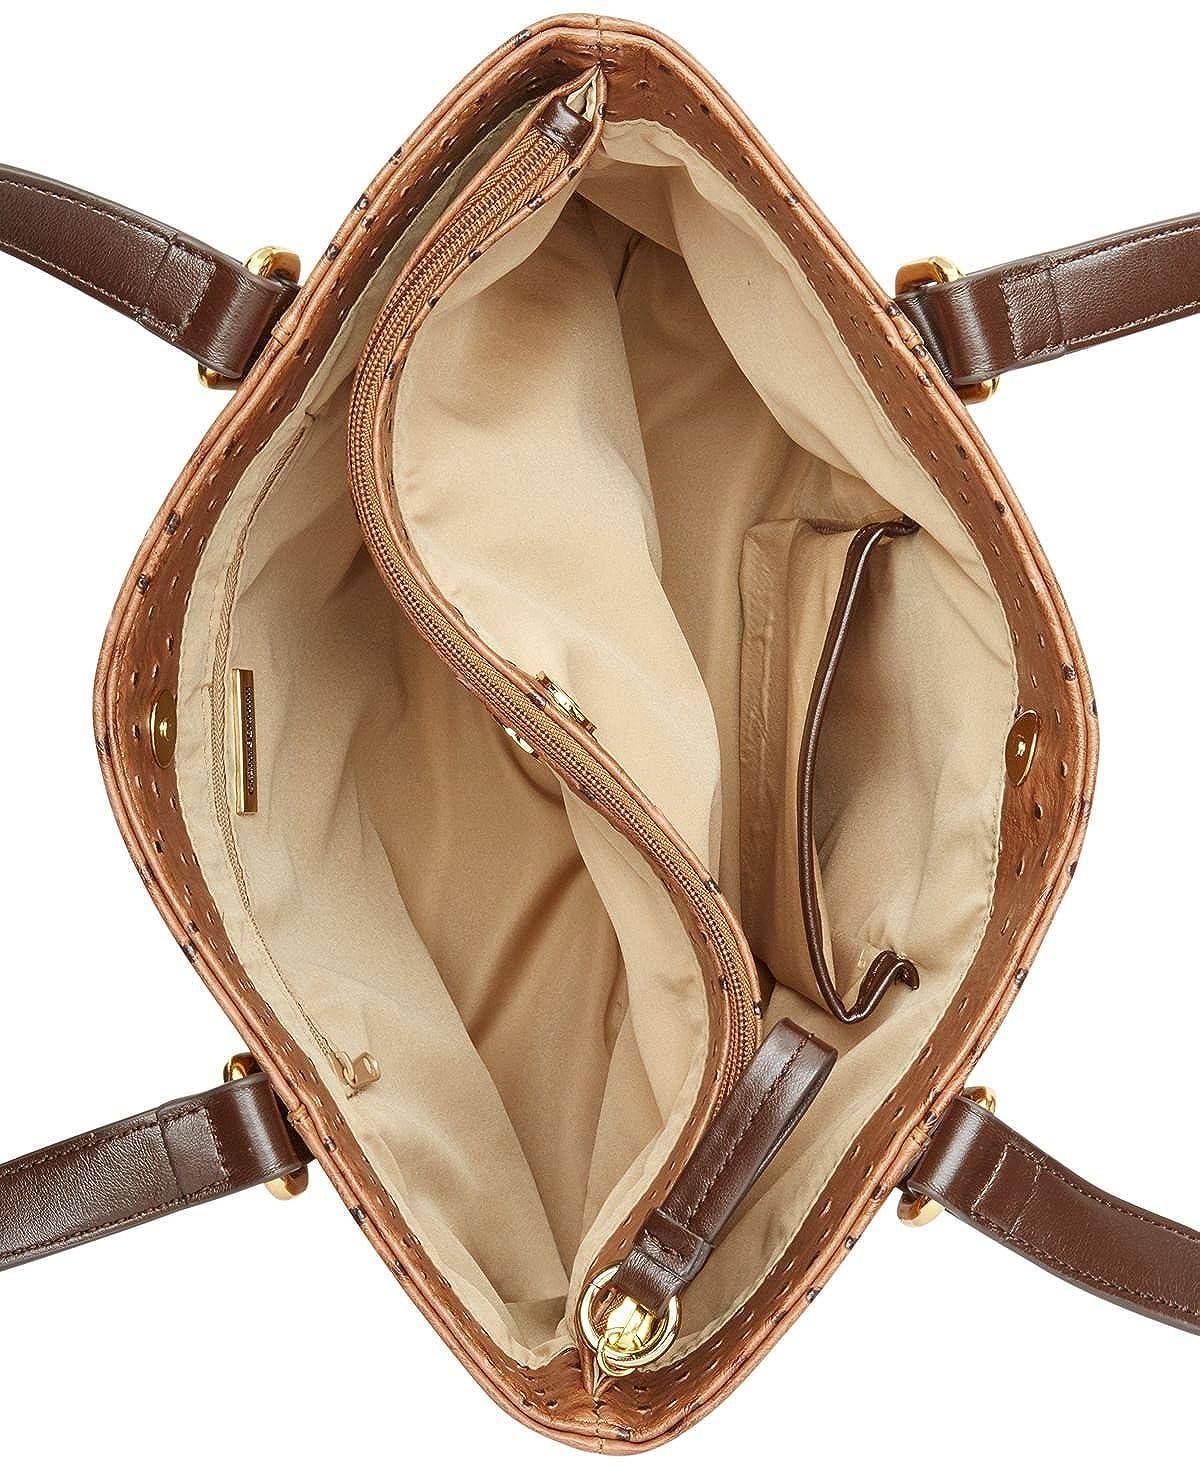 Amazon.com  Giani Bernini Ostrich-Embossed Tote  Shoes 2d64f6f128